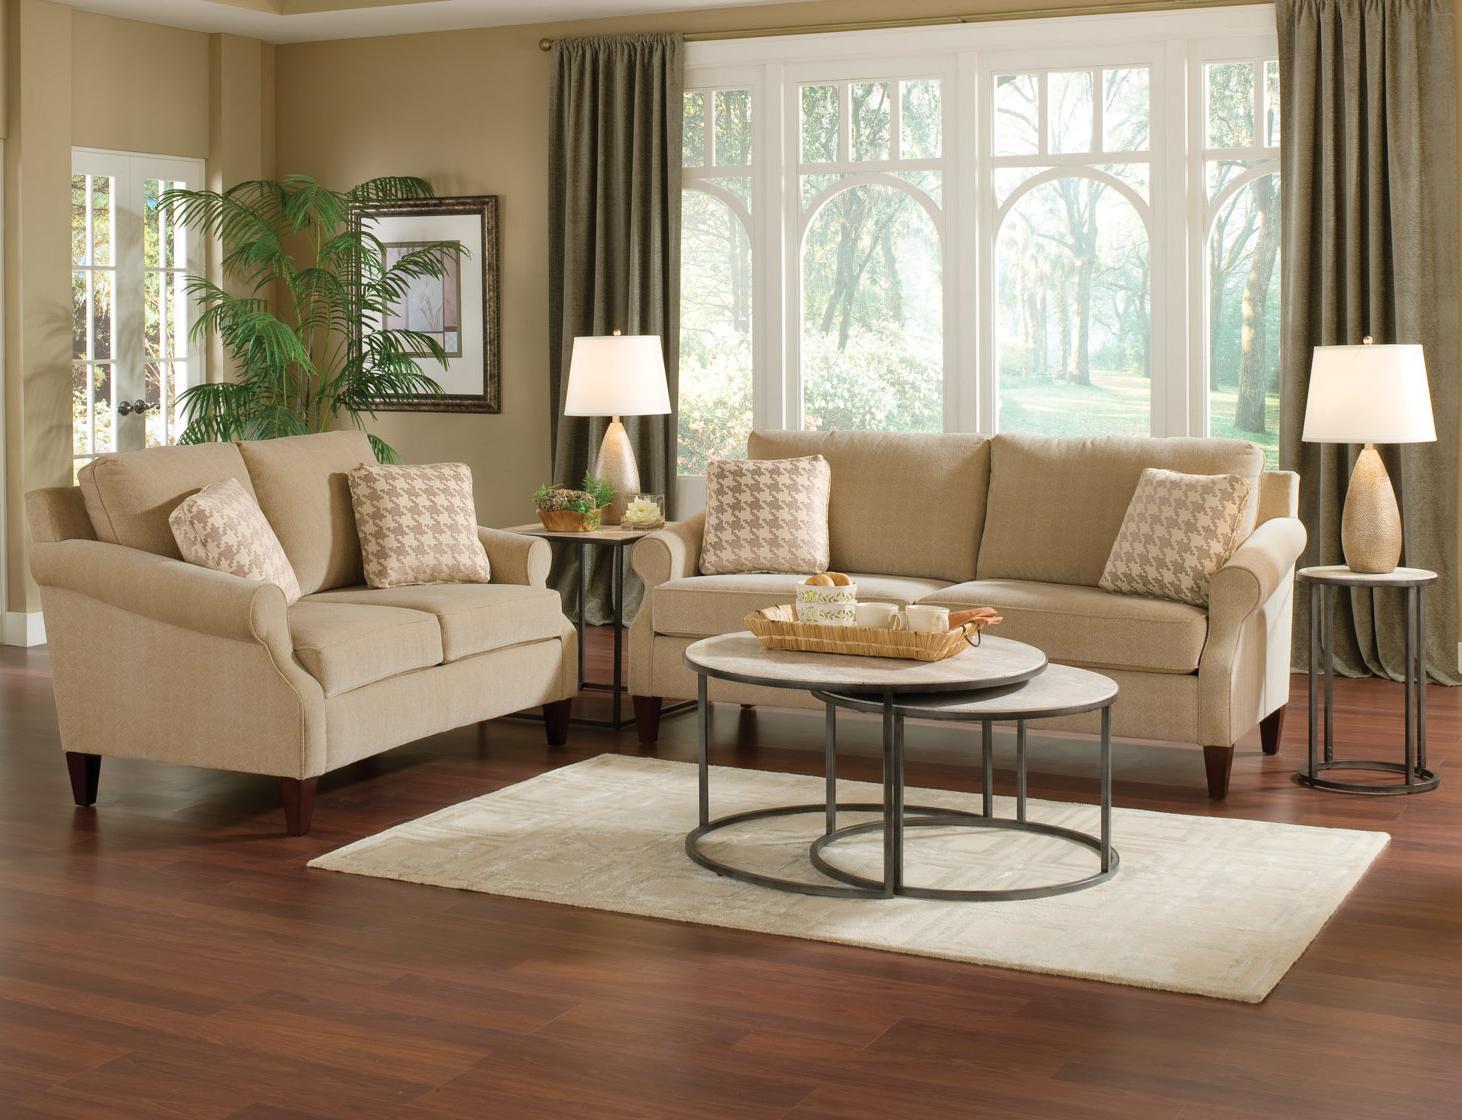 England Duke Stationary Living Room Group - Item Number: 313 Living Room Group 1